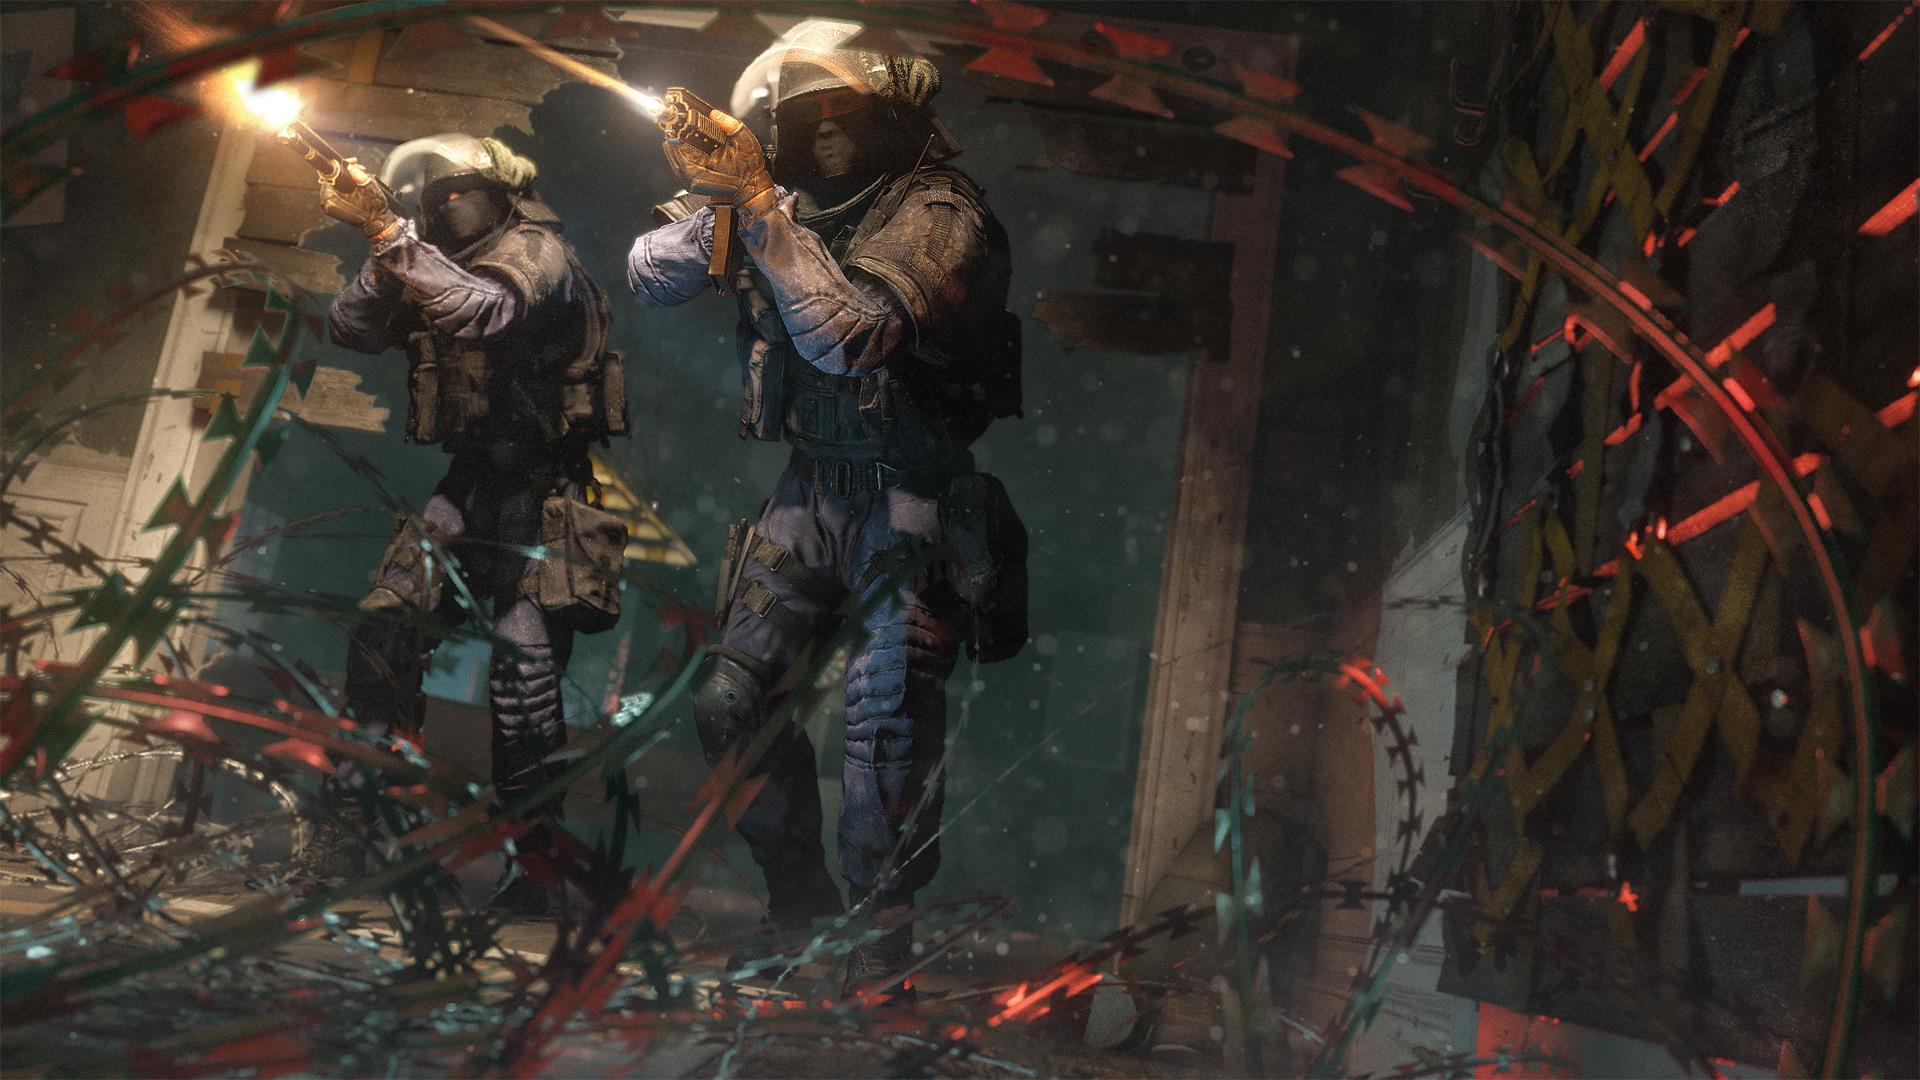 Why Ubisoft put Spectator Mode in Rainbow Six: Siege